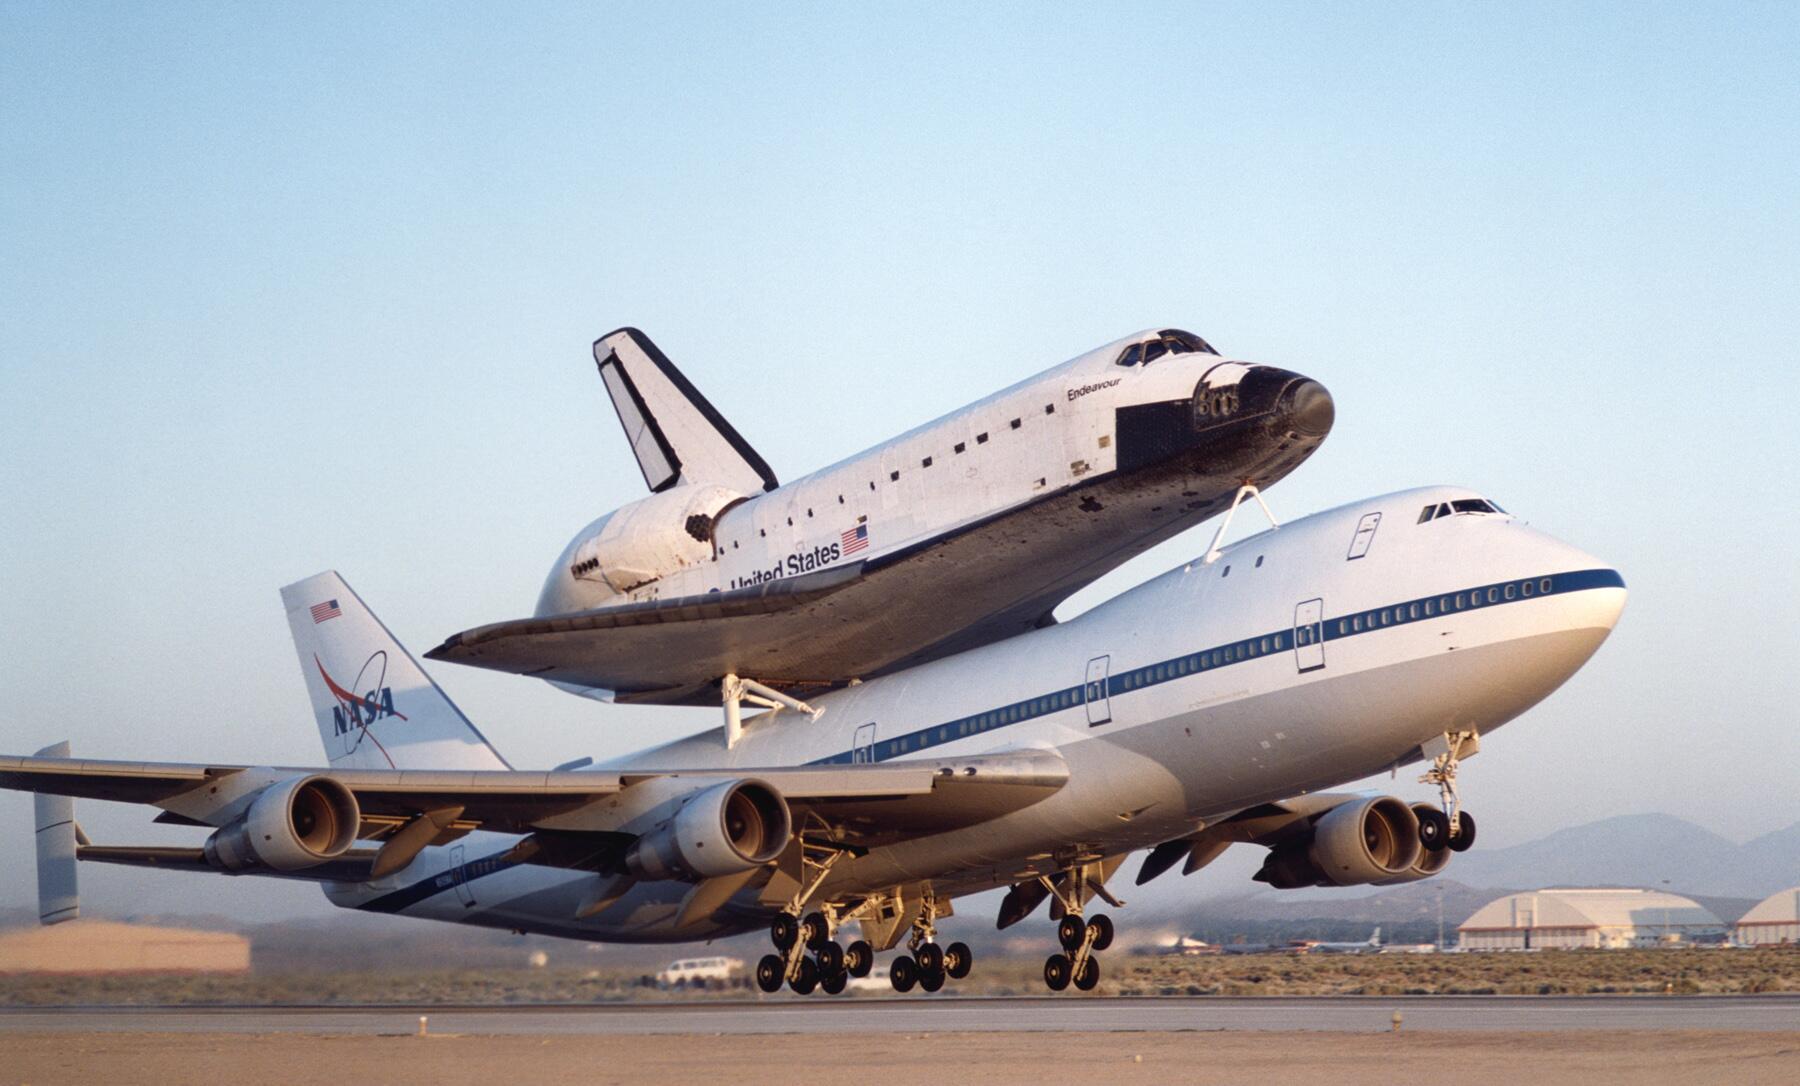 space shuttle namen - photo #42